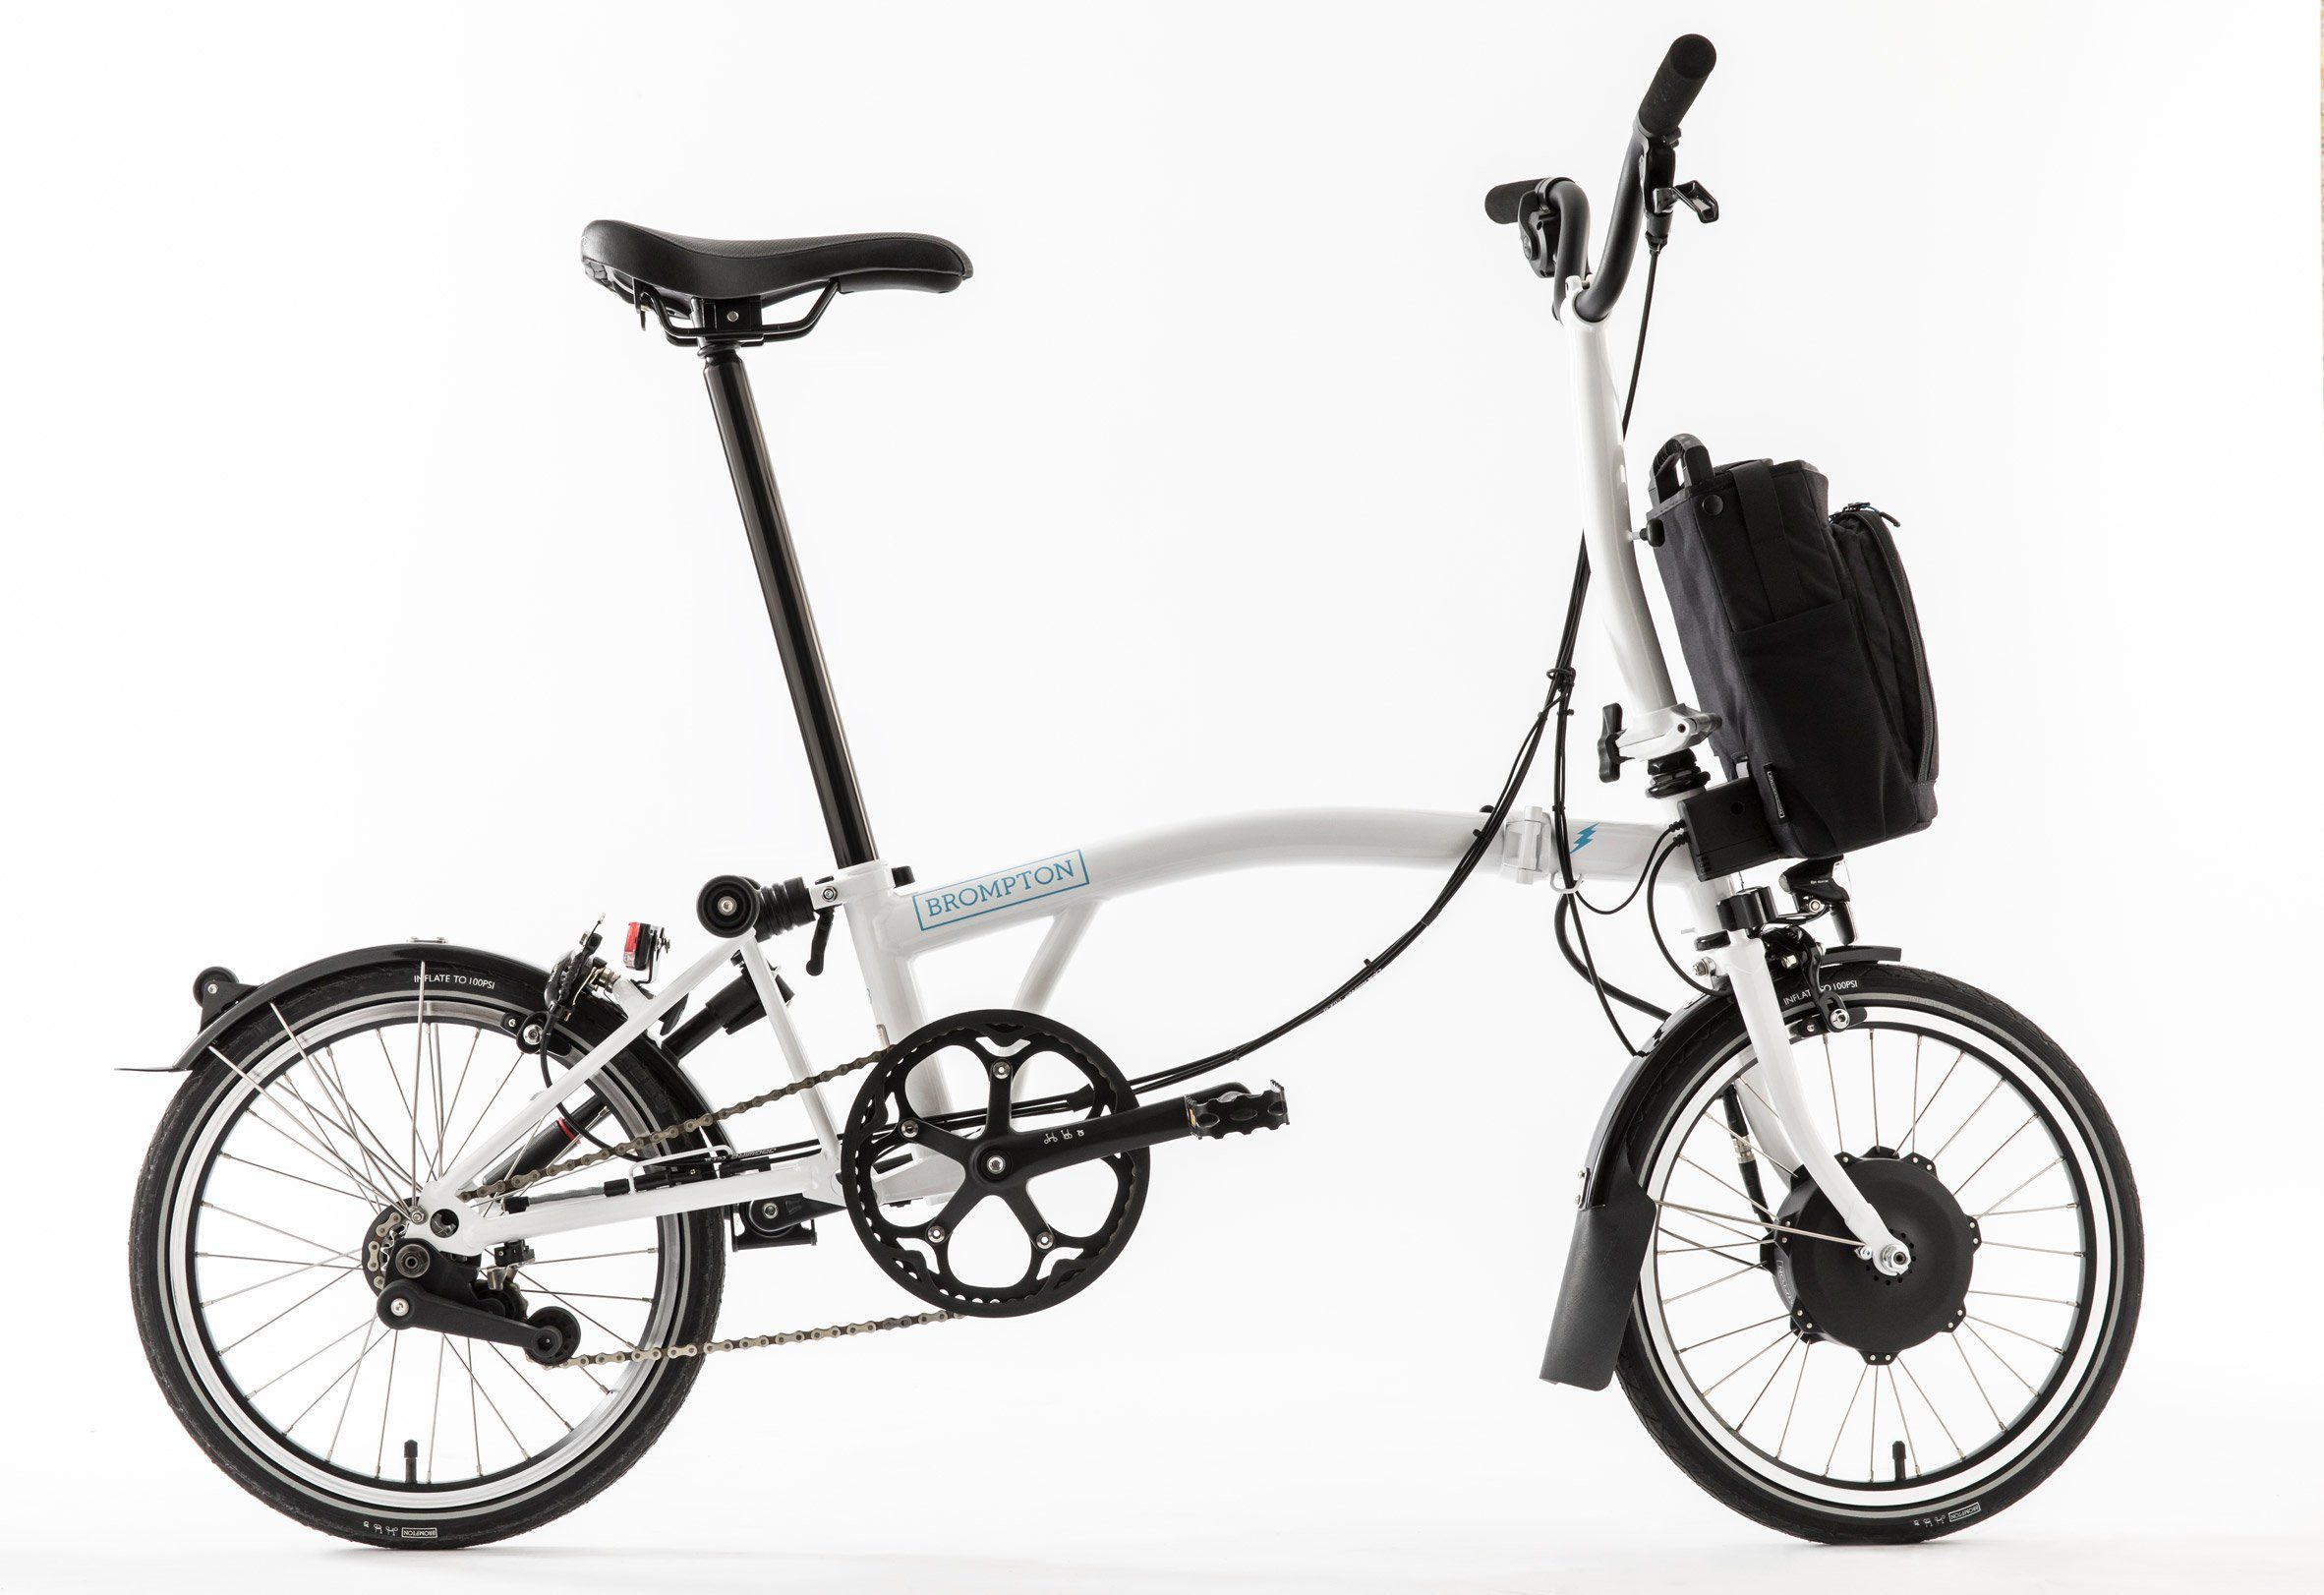 Brompton Launches First Battery Powered Version Of Its Folding Bike Folding Bike Brompton Electric Bike